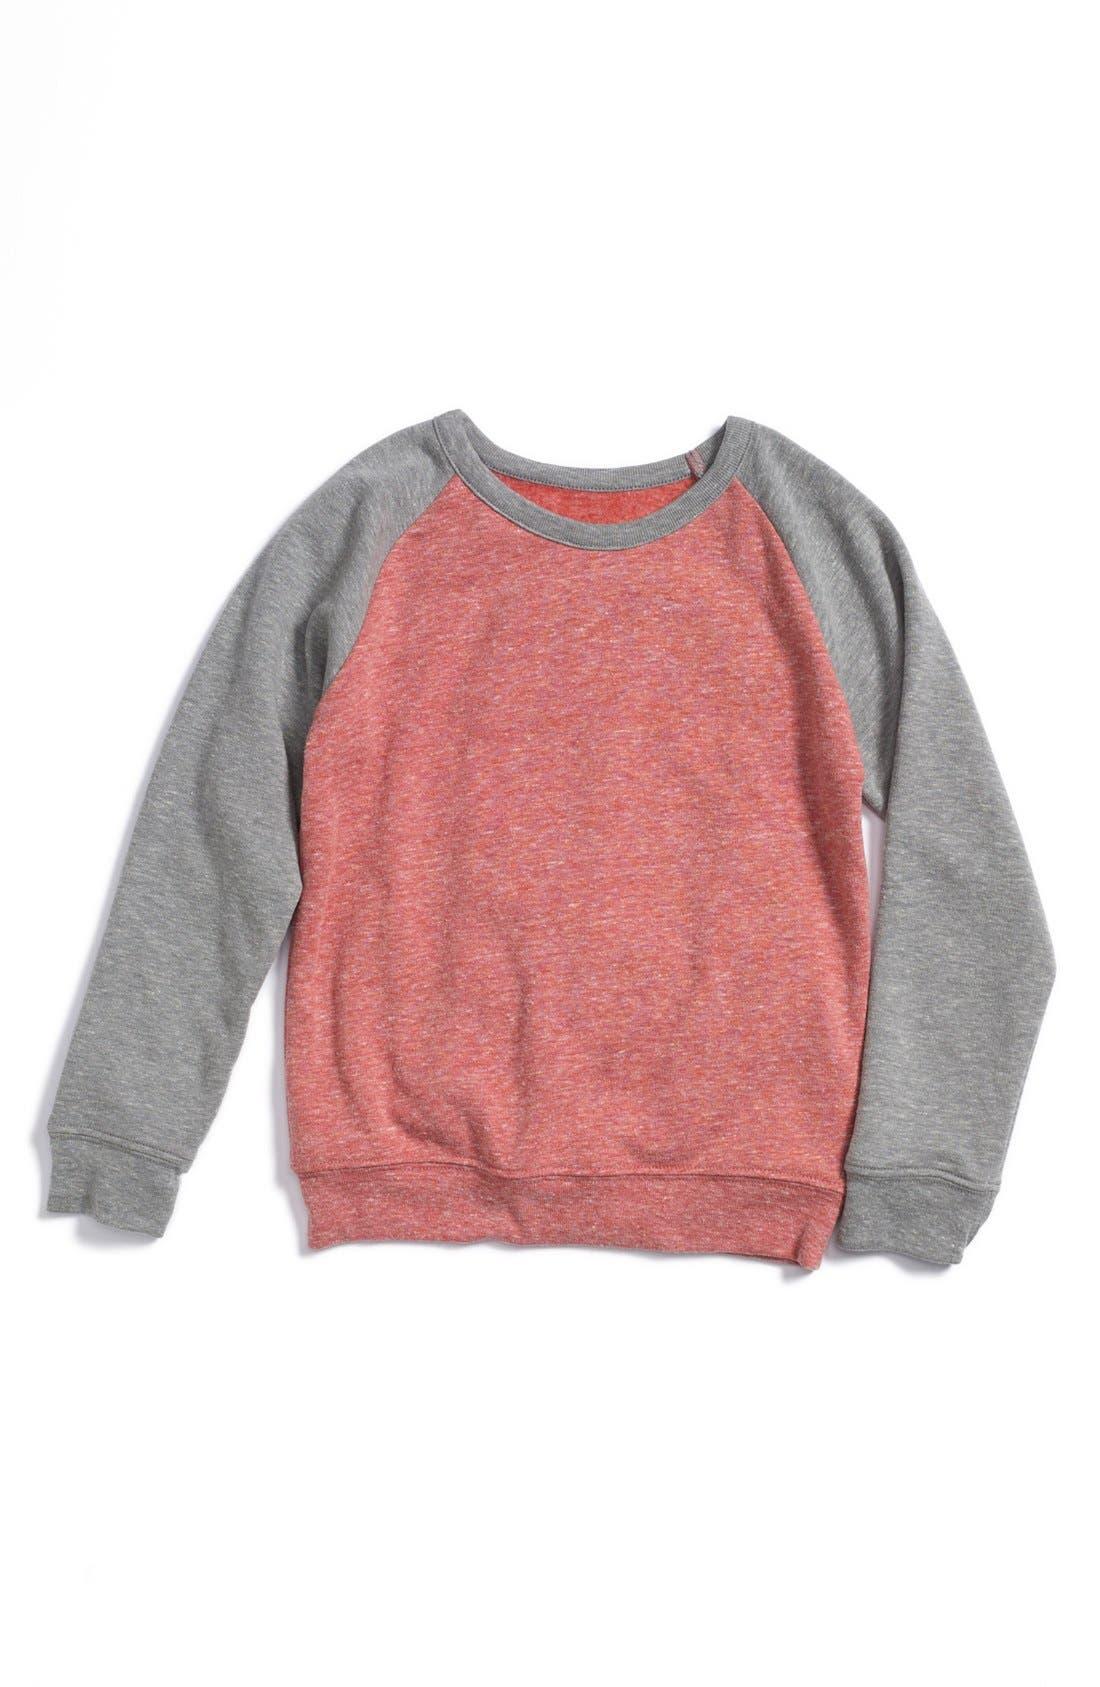 Alternate Image 1 Selected - Tucker + Tate Fleece Sweatshirt (Little Boys)